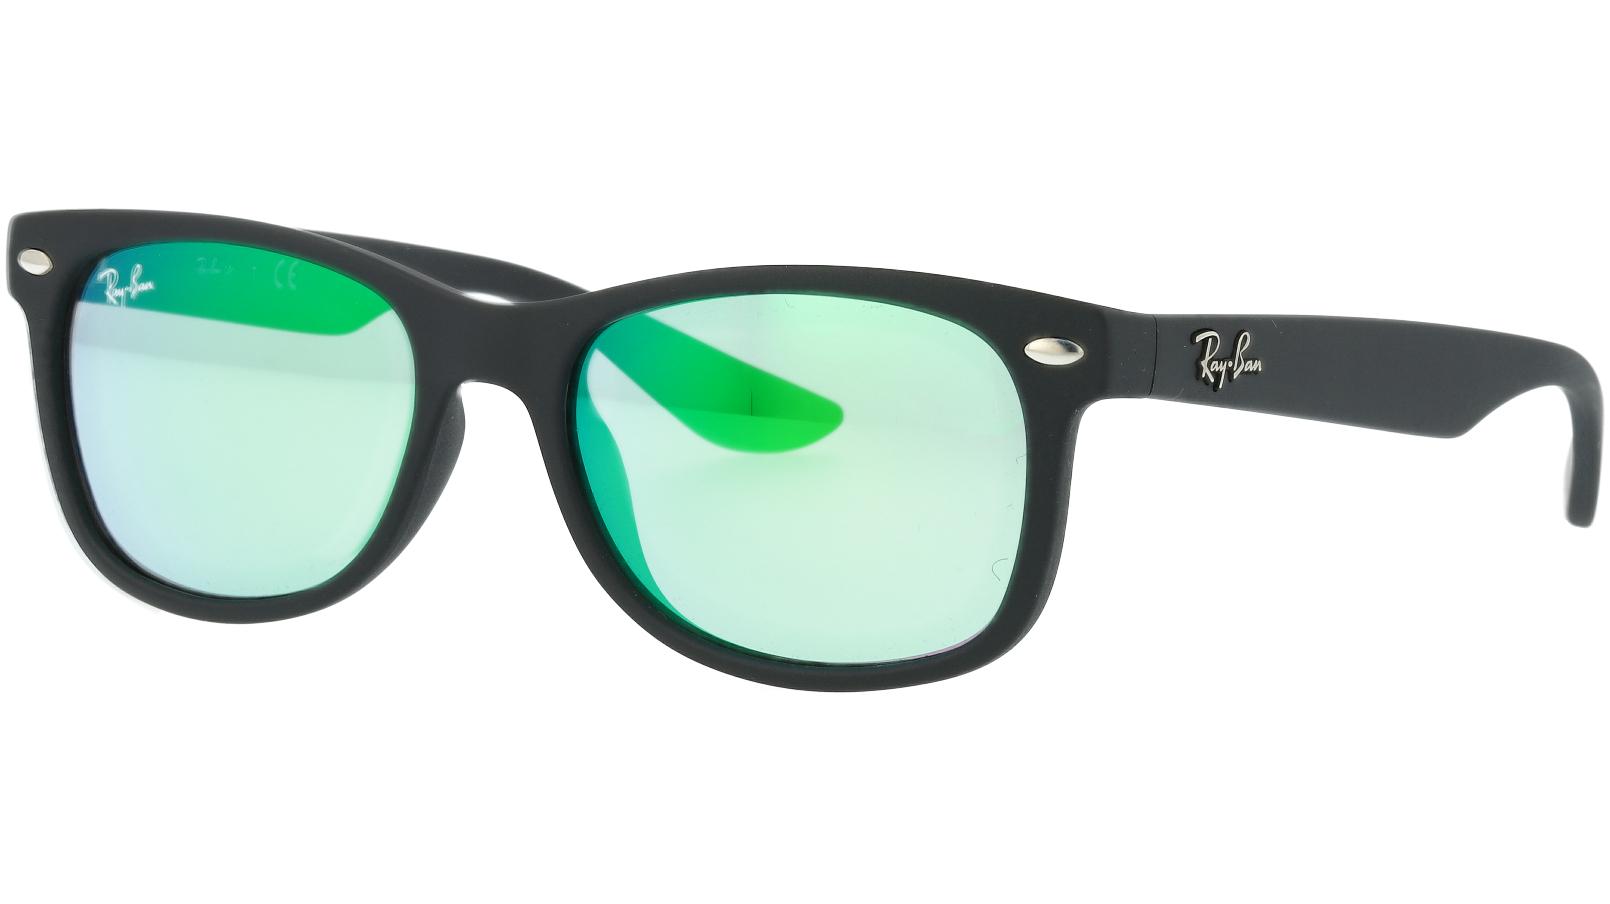 RAYBAN RJ9052S 100S/3R 47 MATT Sunglasses